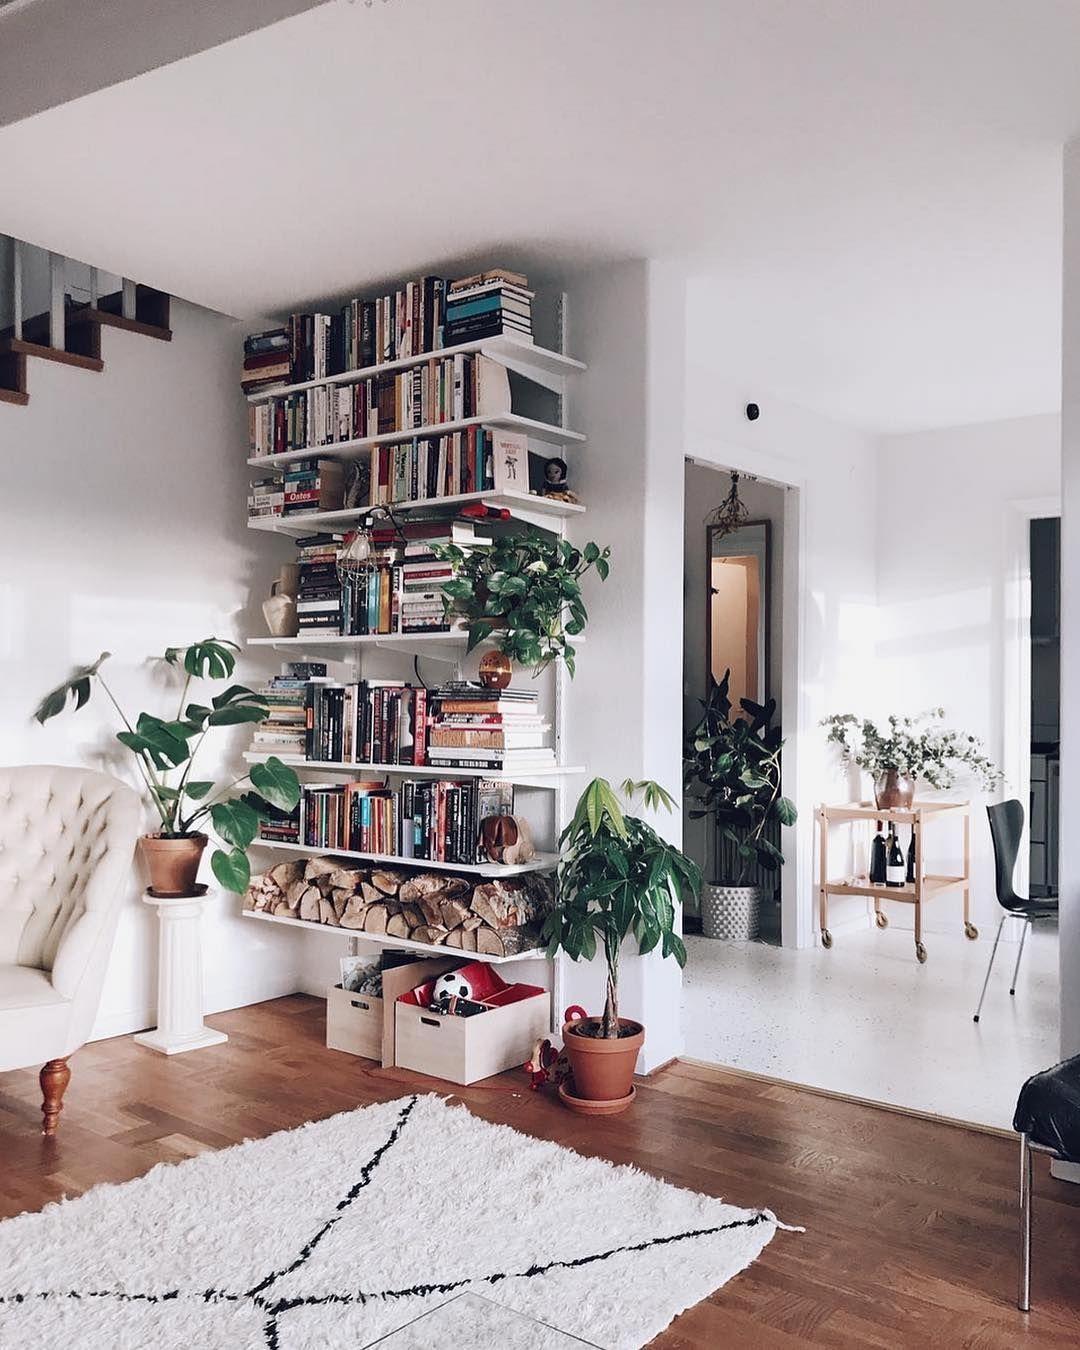 10 7k Likes 129 Comments My Scandinavian Home Myscandinavianhome On Instagram Hands Up Who Loves A Stash Of Books As Muc Boligindretning Hjem Boghylder